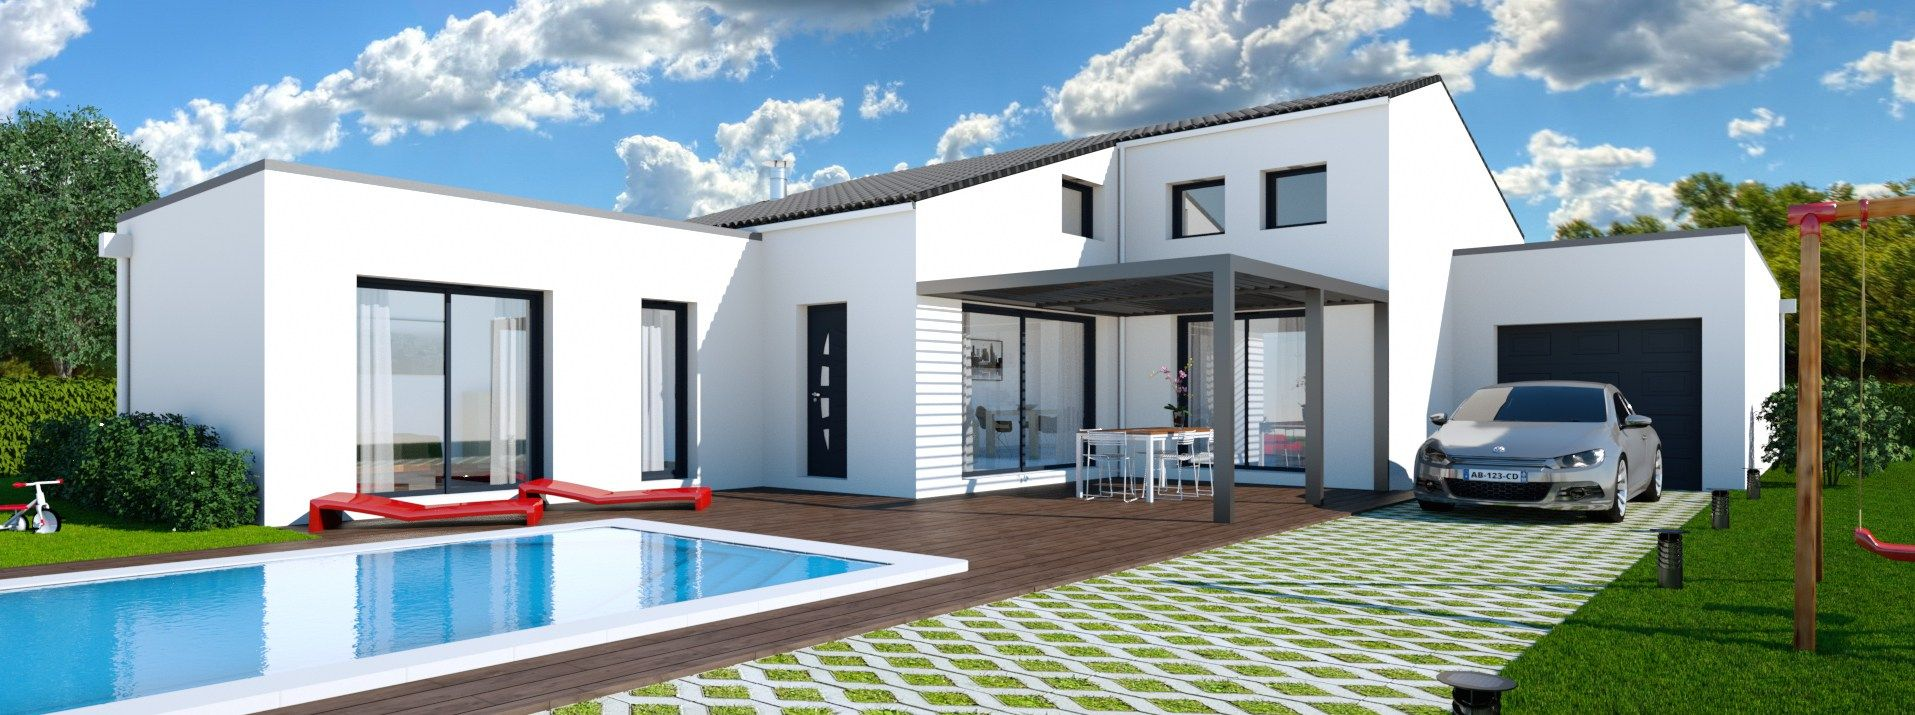 Cedreo home planner logiciel plan maison ikea home planner file extensions home design for Ikea logiciel maison